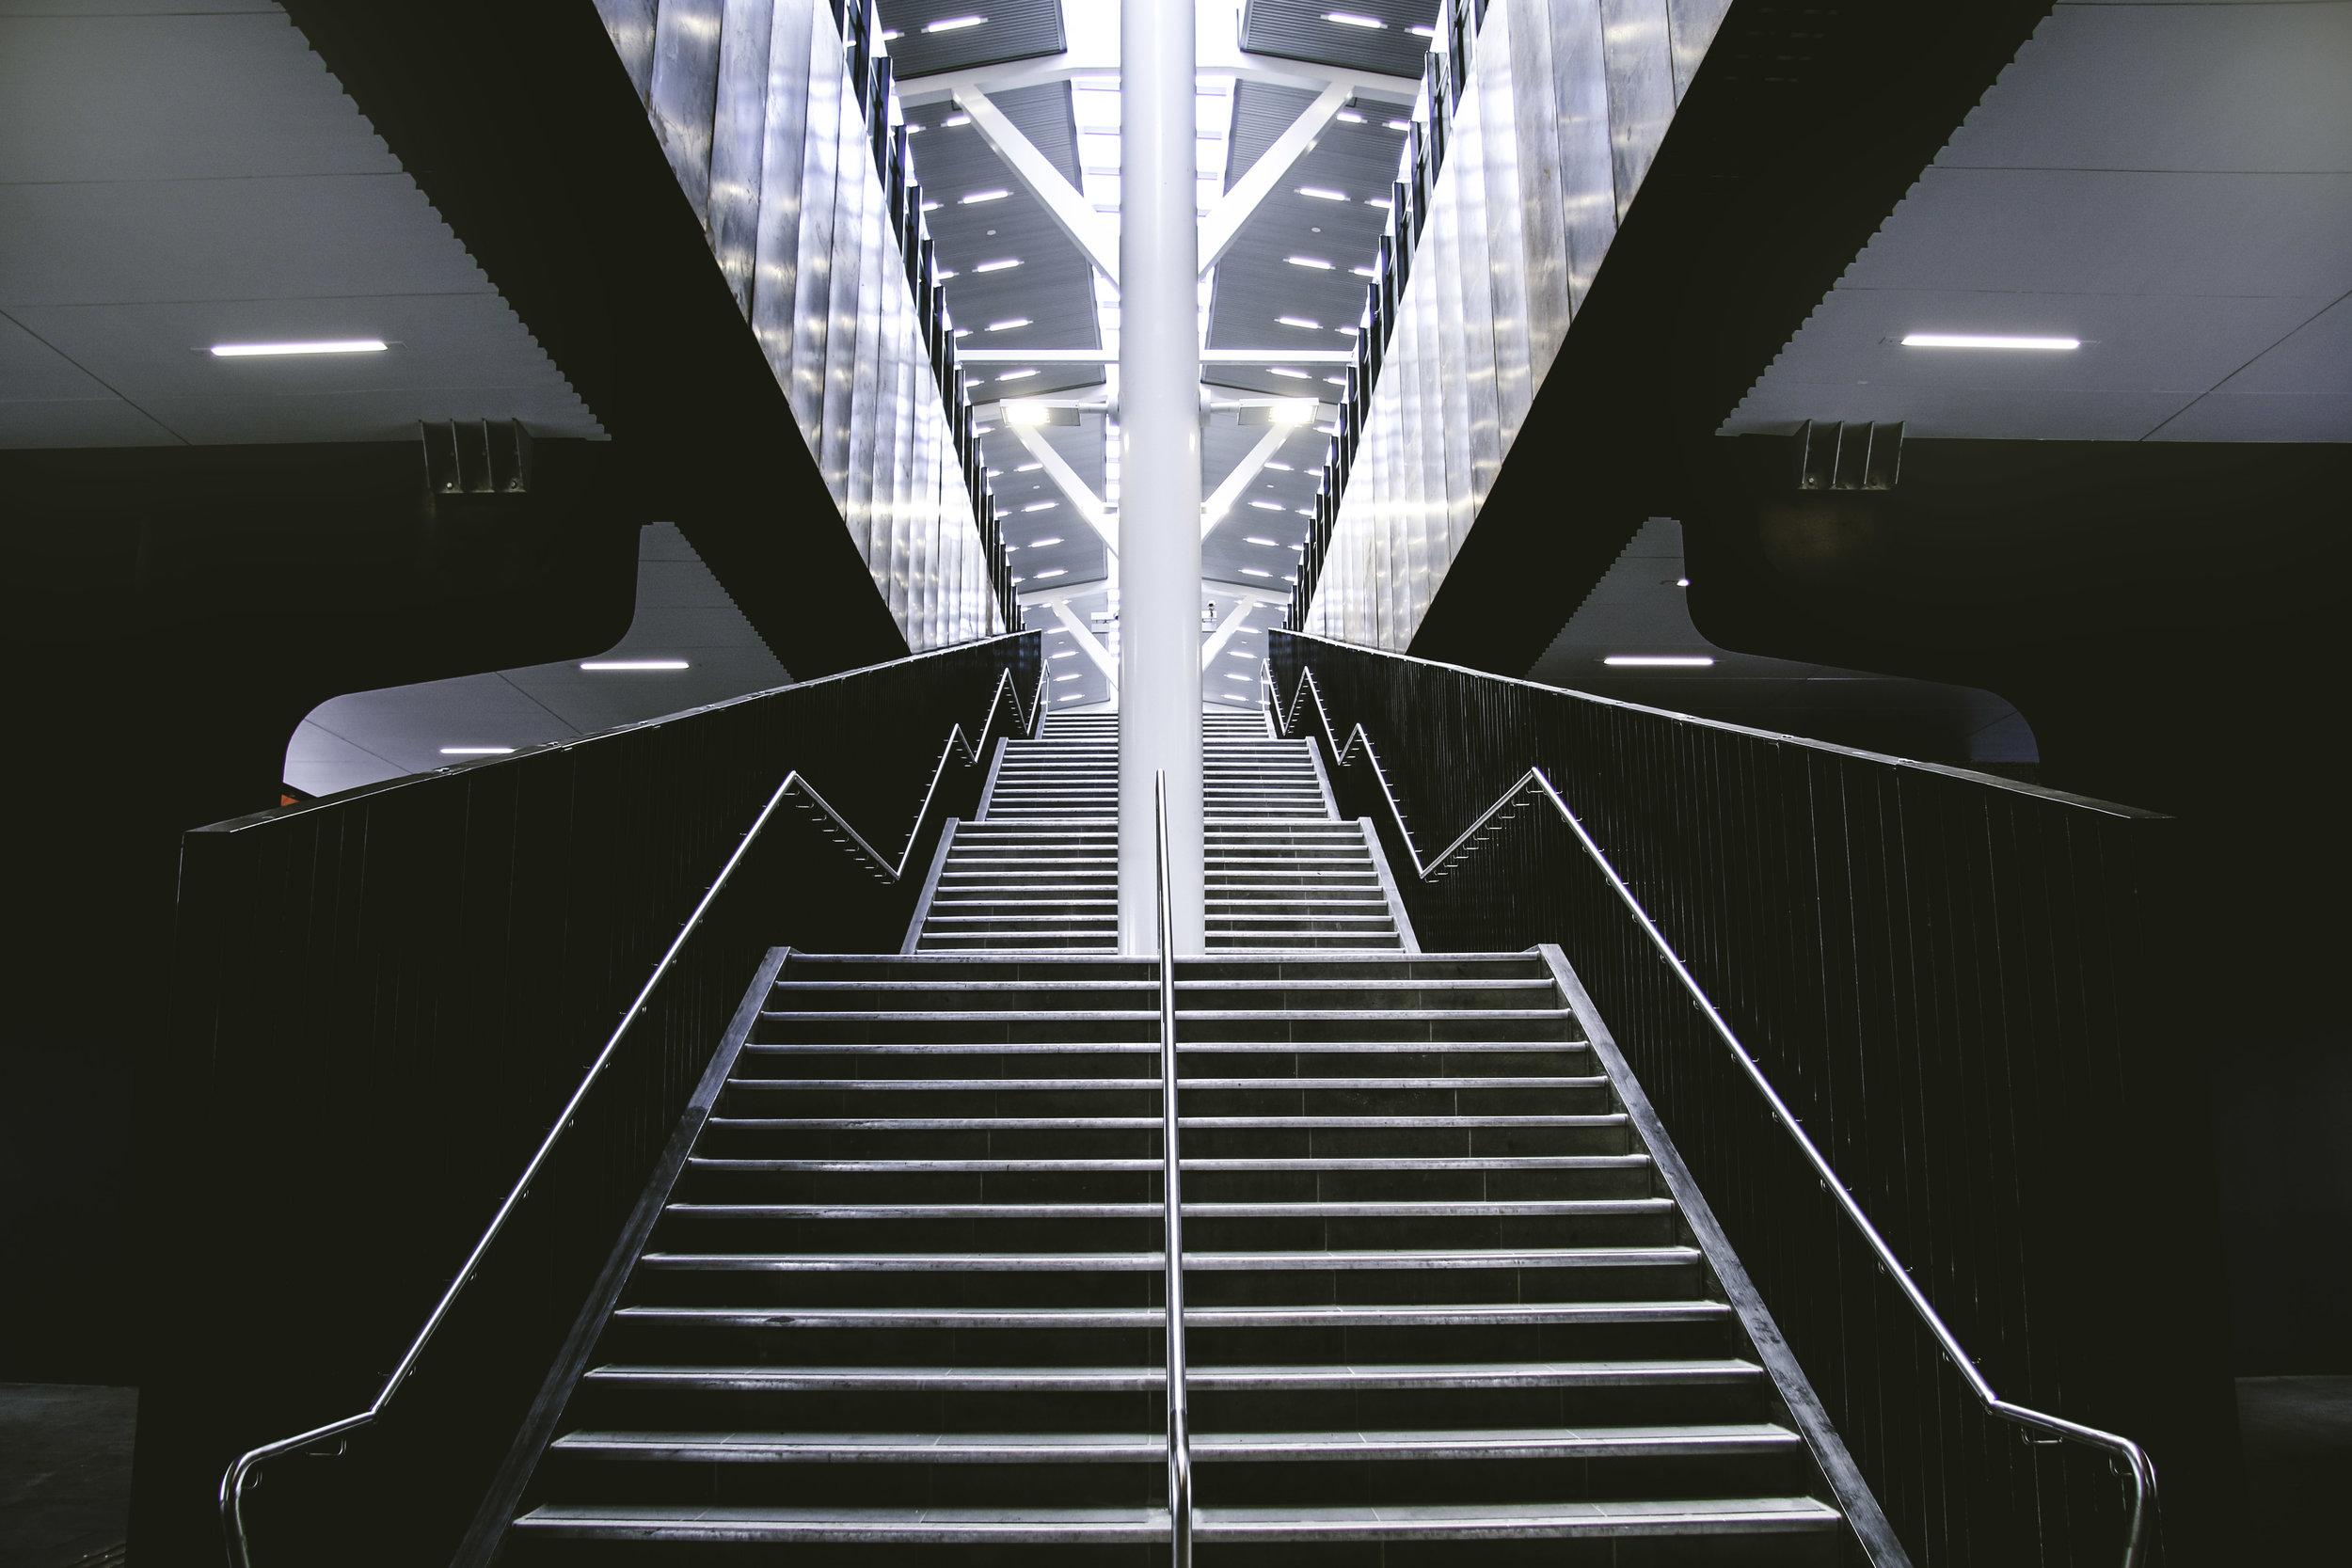 Void & Stair Ballustrade